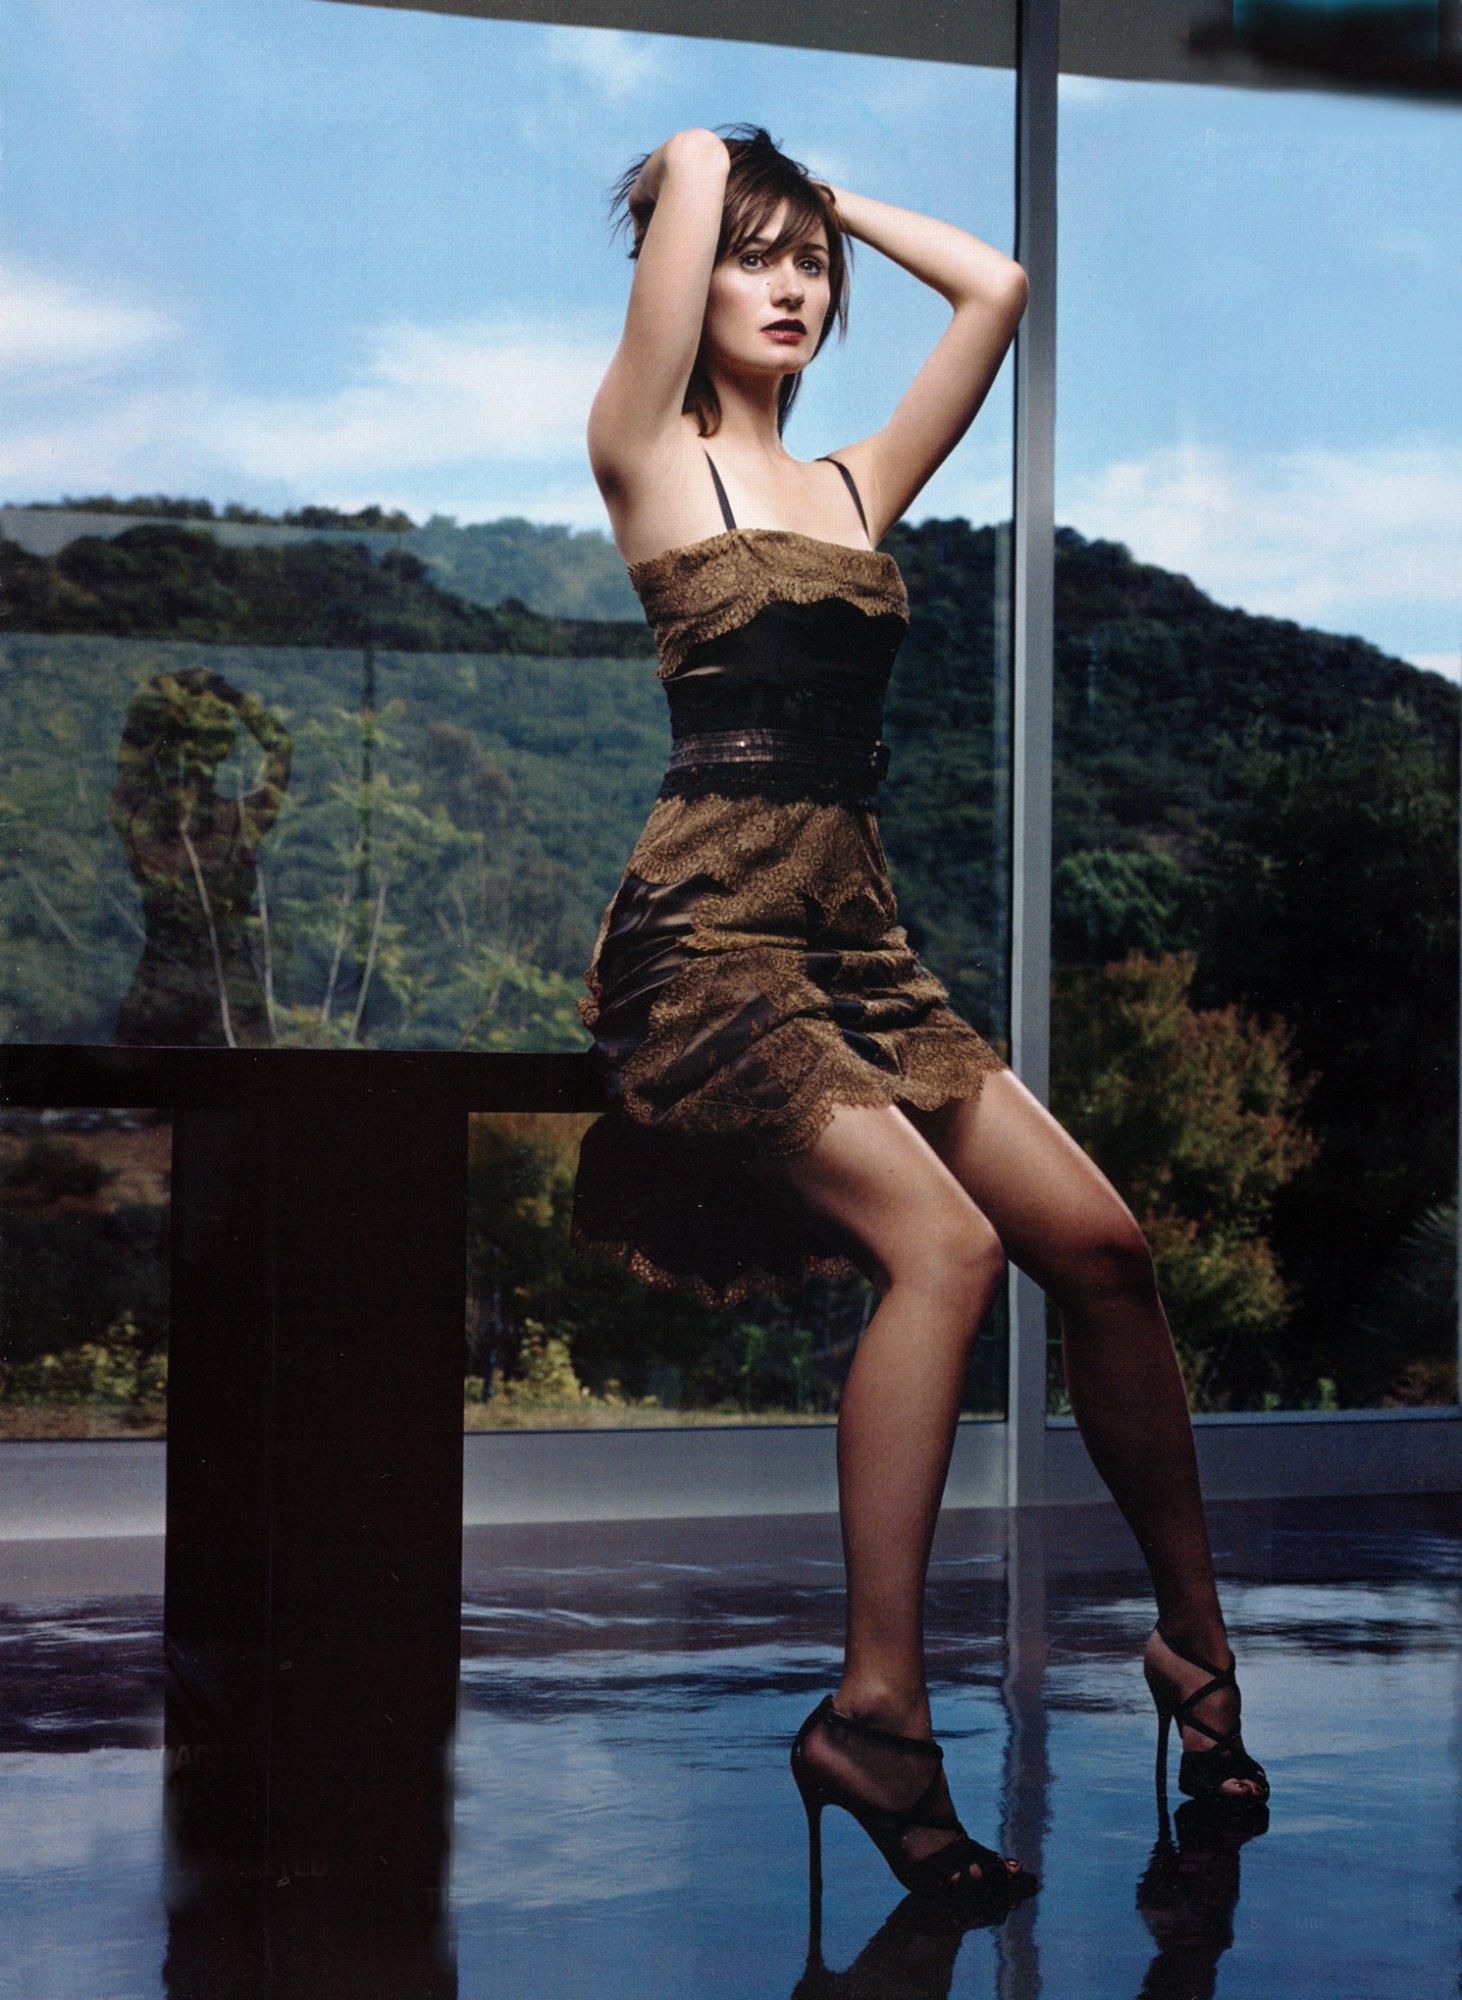 Scarlett johansson 2014 all full hot scenes latest - 1 part 9